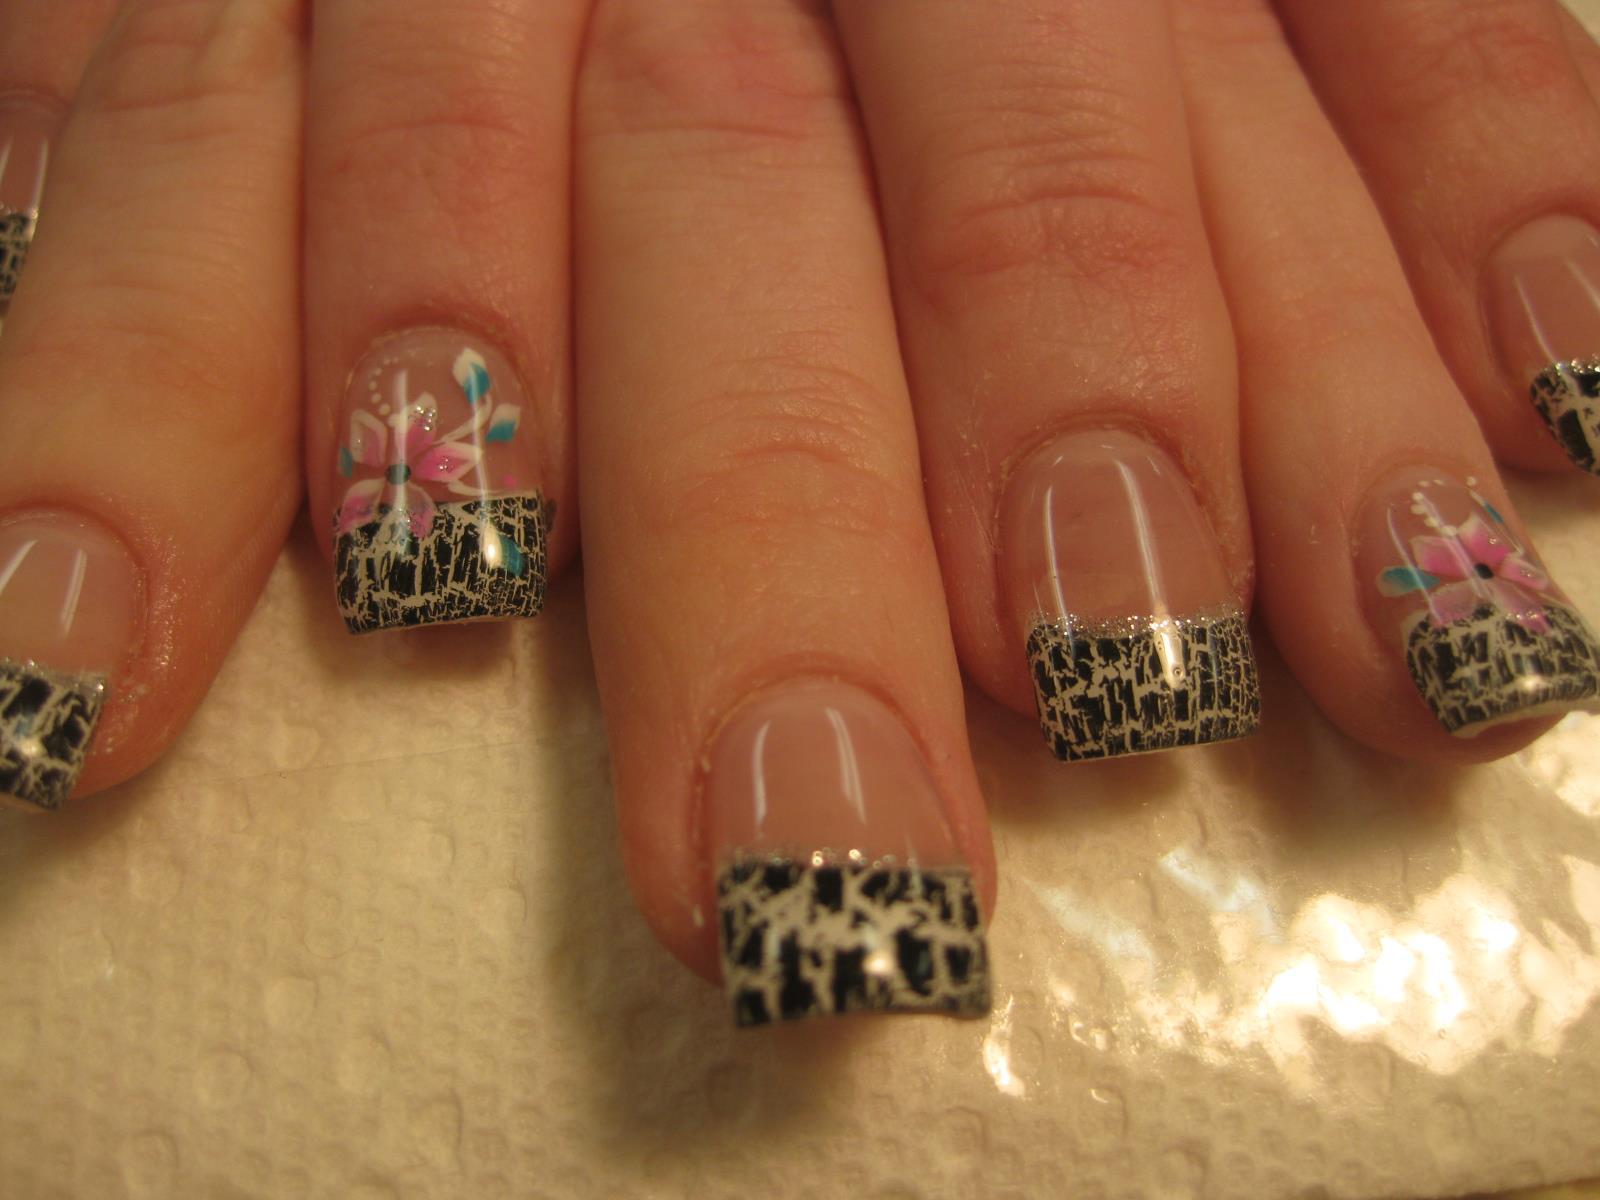 Street Flowers, nail art design by Top Nails, Clarksville TN.